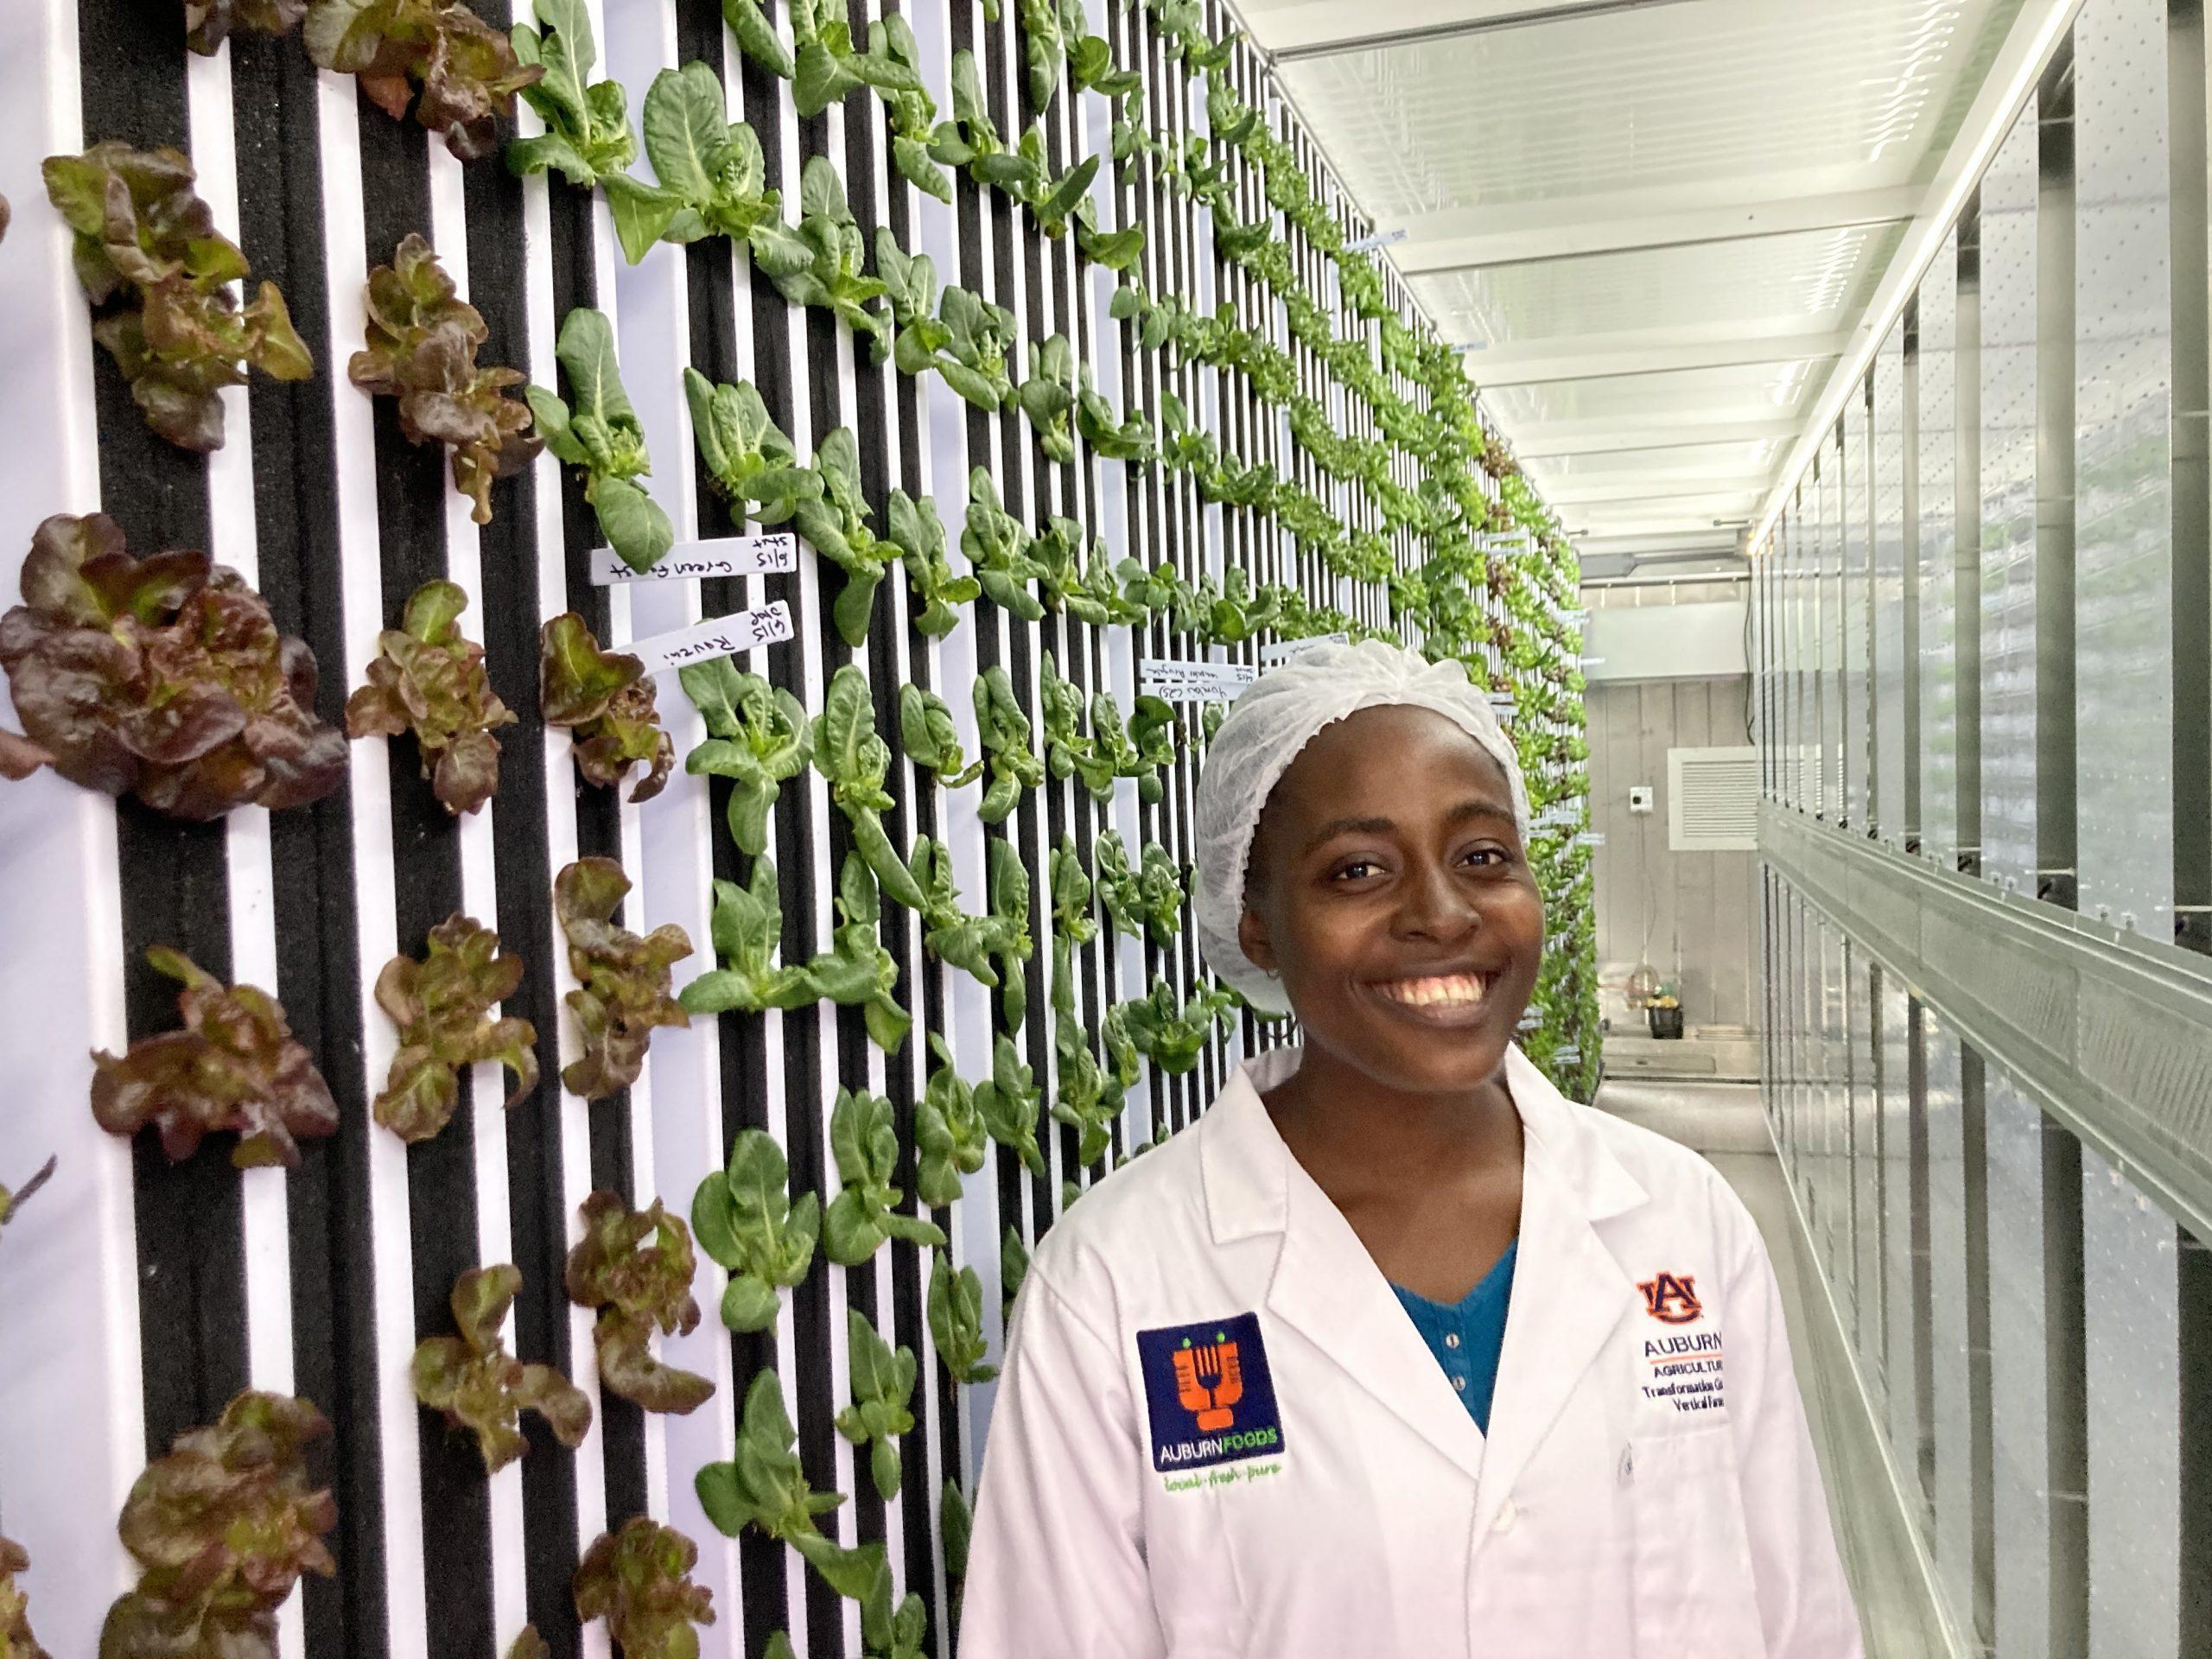 Dorcas Lukwesa with a vertical aquaponics system